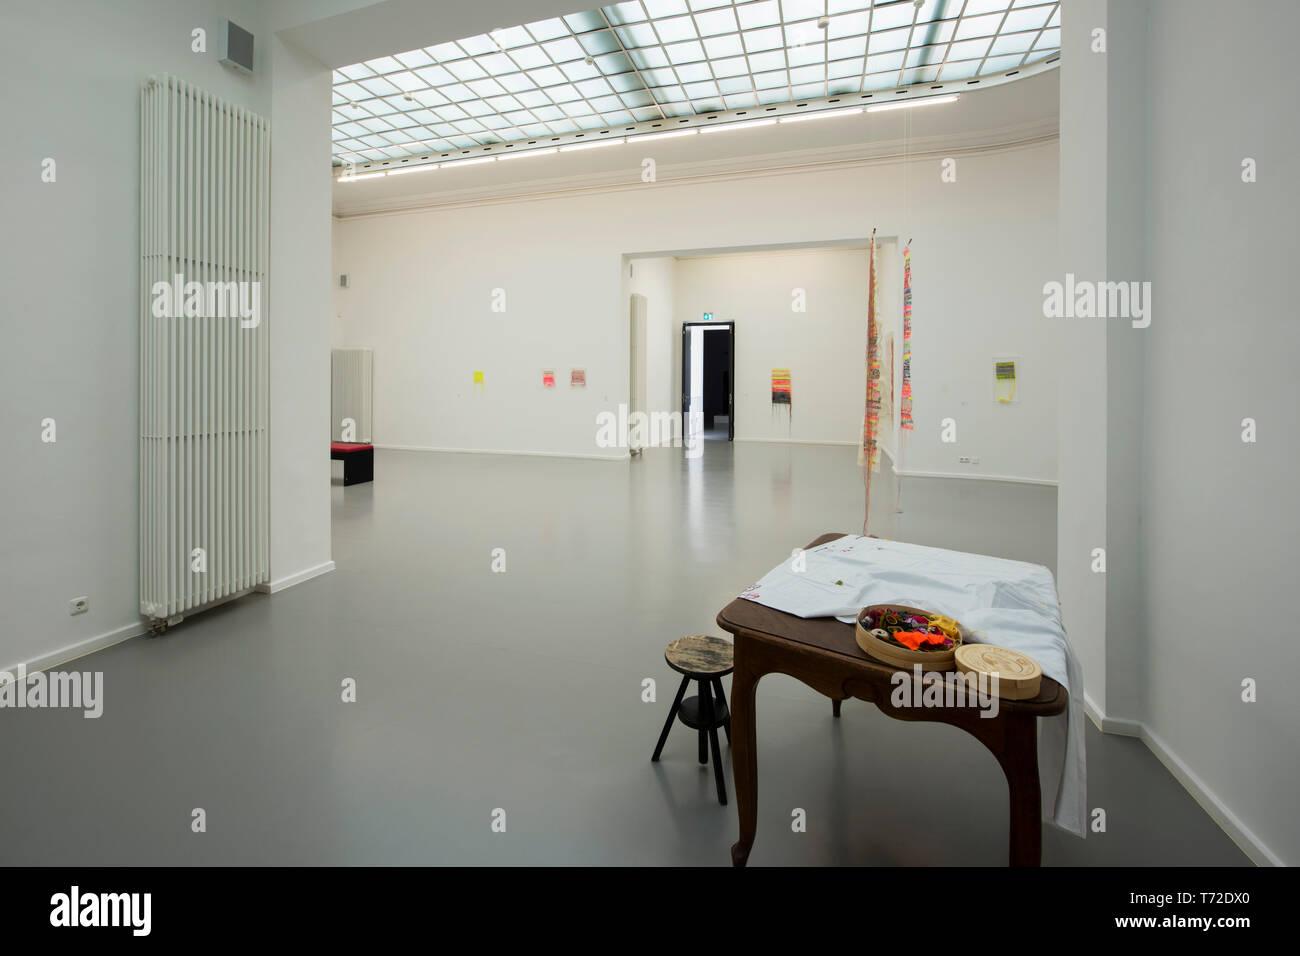 Deutschland, NRW, Düren, Leopold-Hoesch-Museum, Austellungsraum - Stock Image